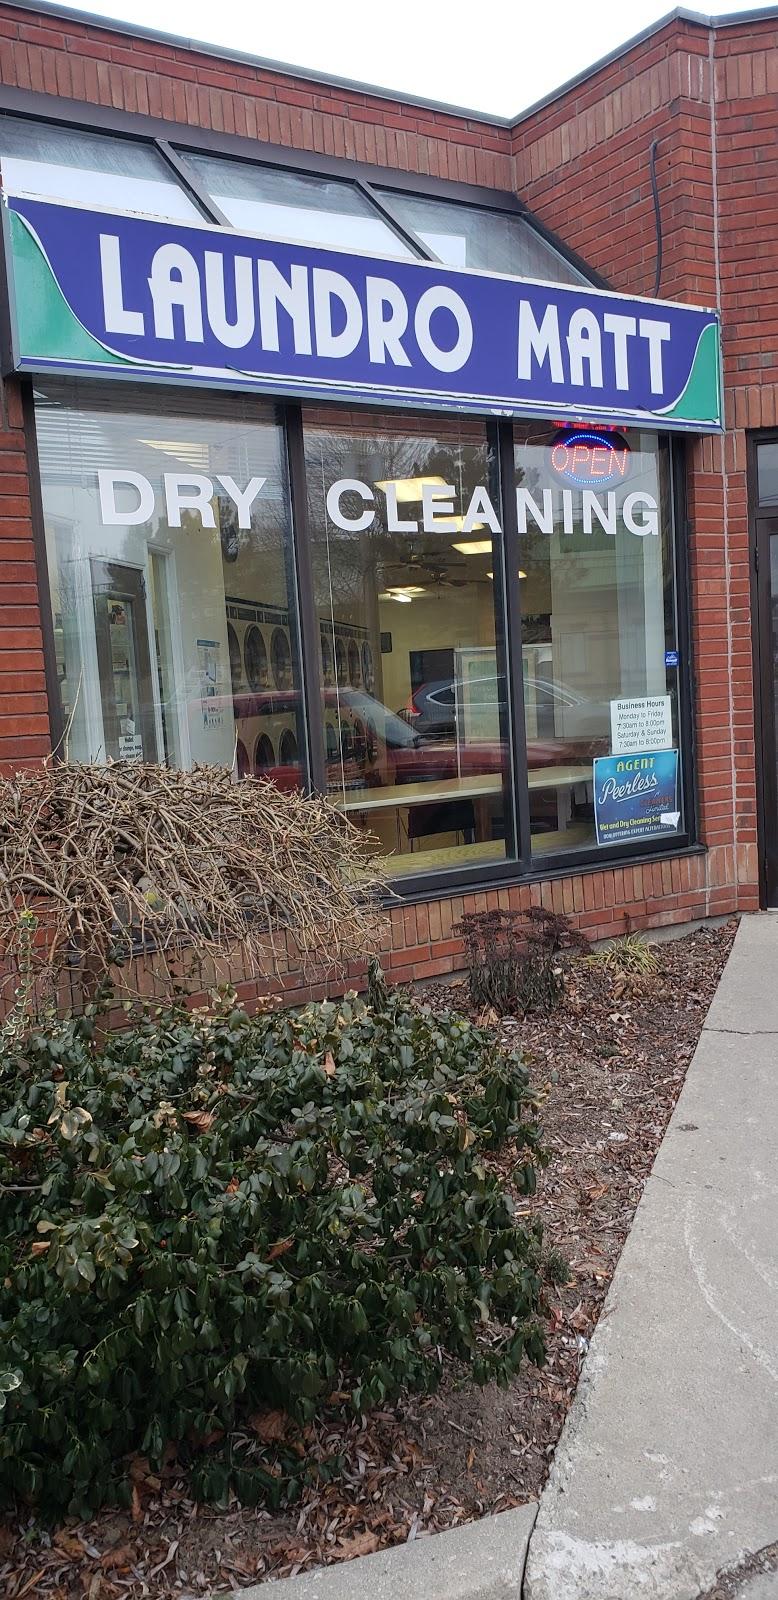 Laundro-Matt | laundry | 263 Argyle St S, Caledonia, ON N3W 1K7, Canada | 9057653998 OR +1 905-765-3998